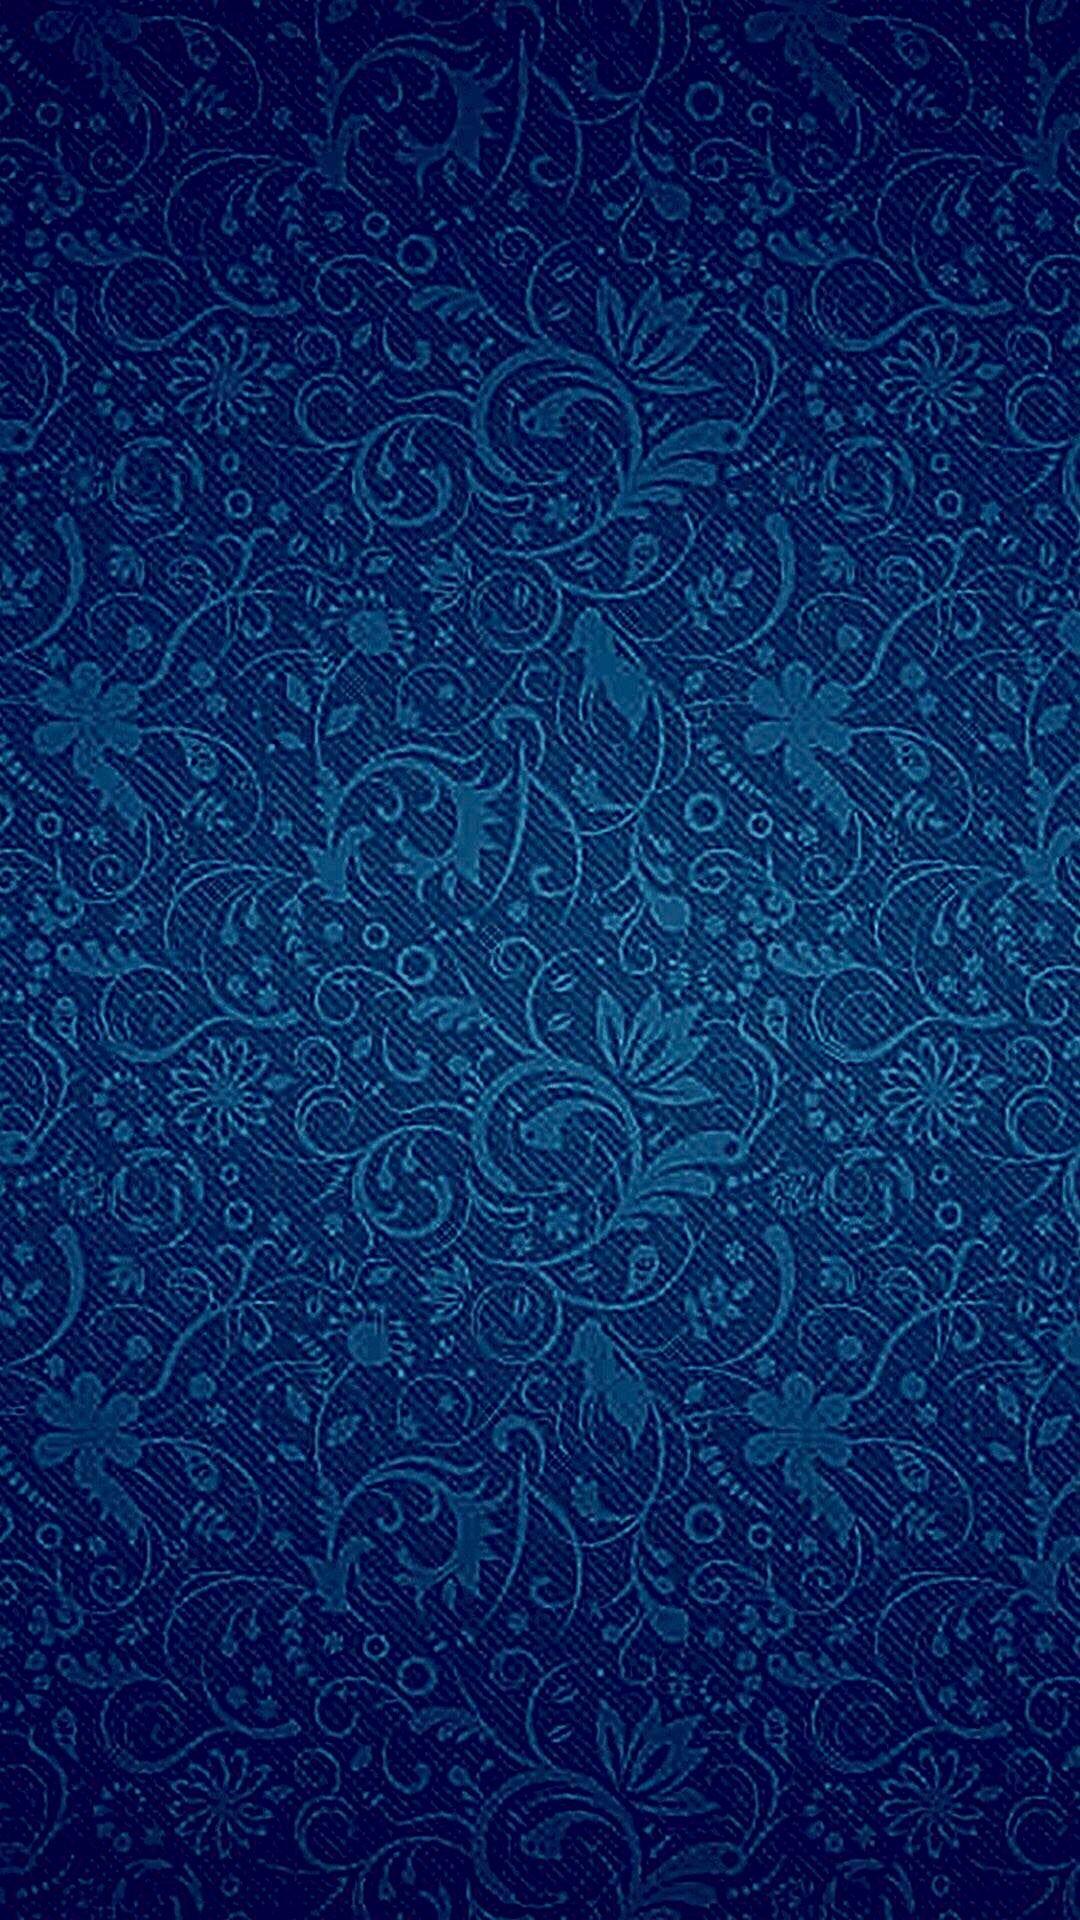 Blue Pattern texture background wallpaper Blue